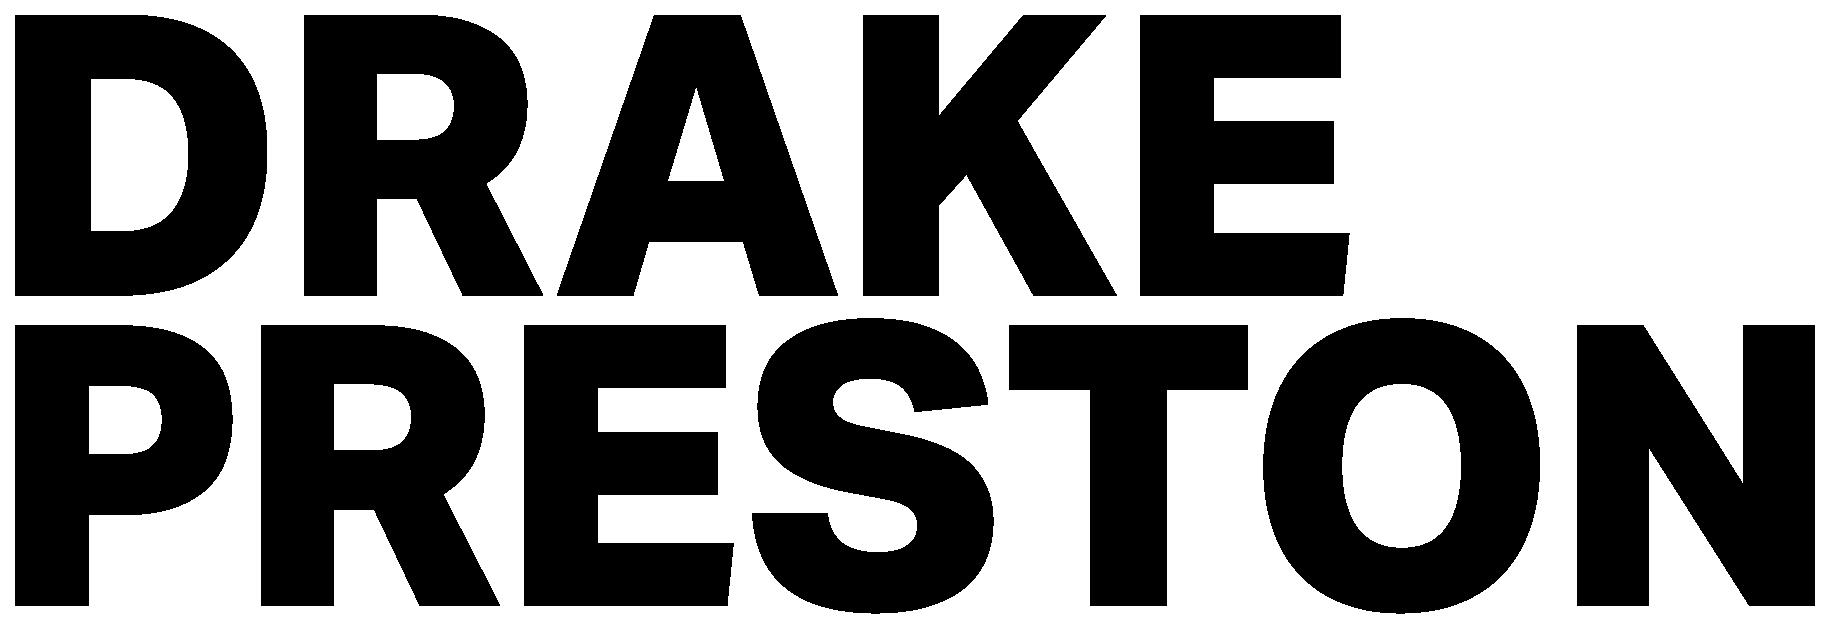 Drake Preston